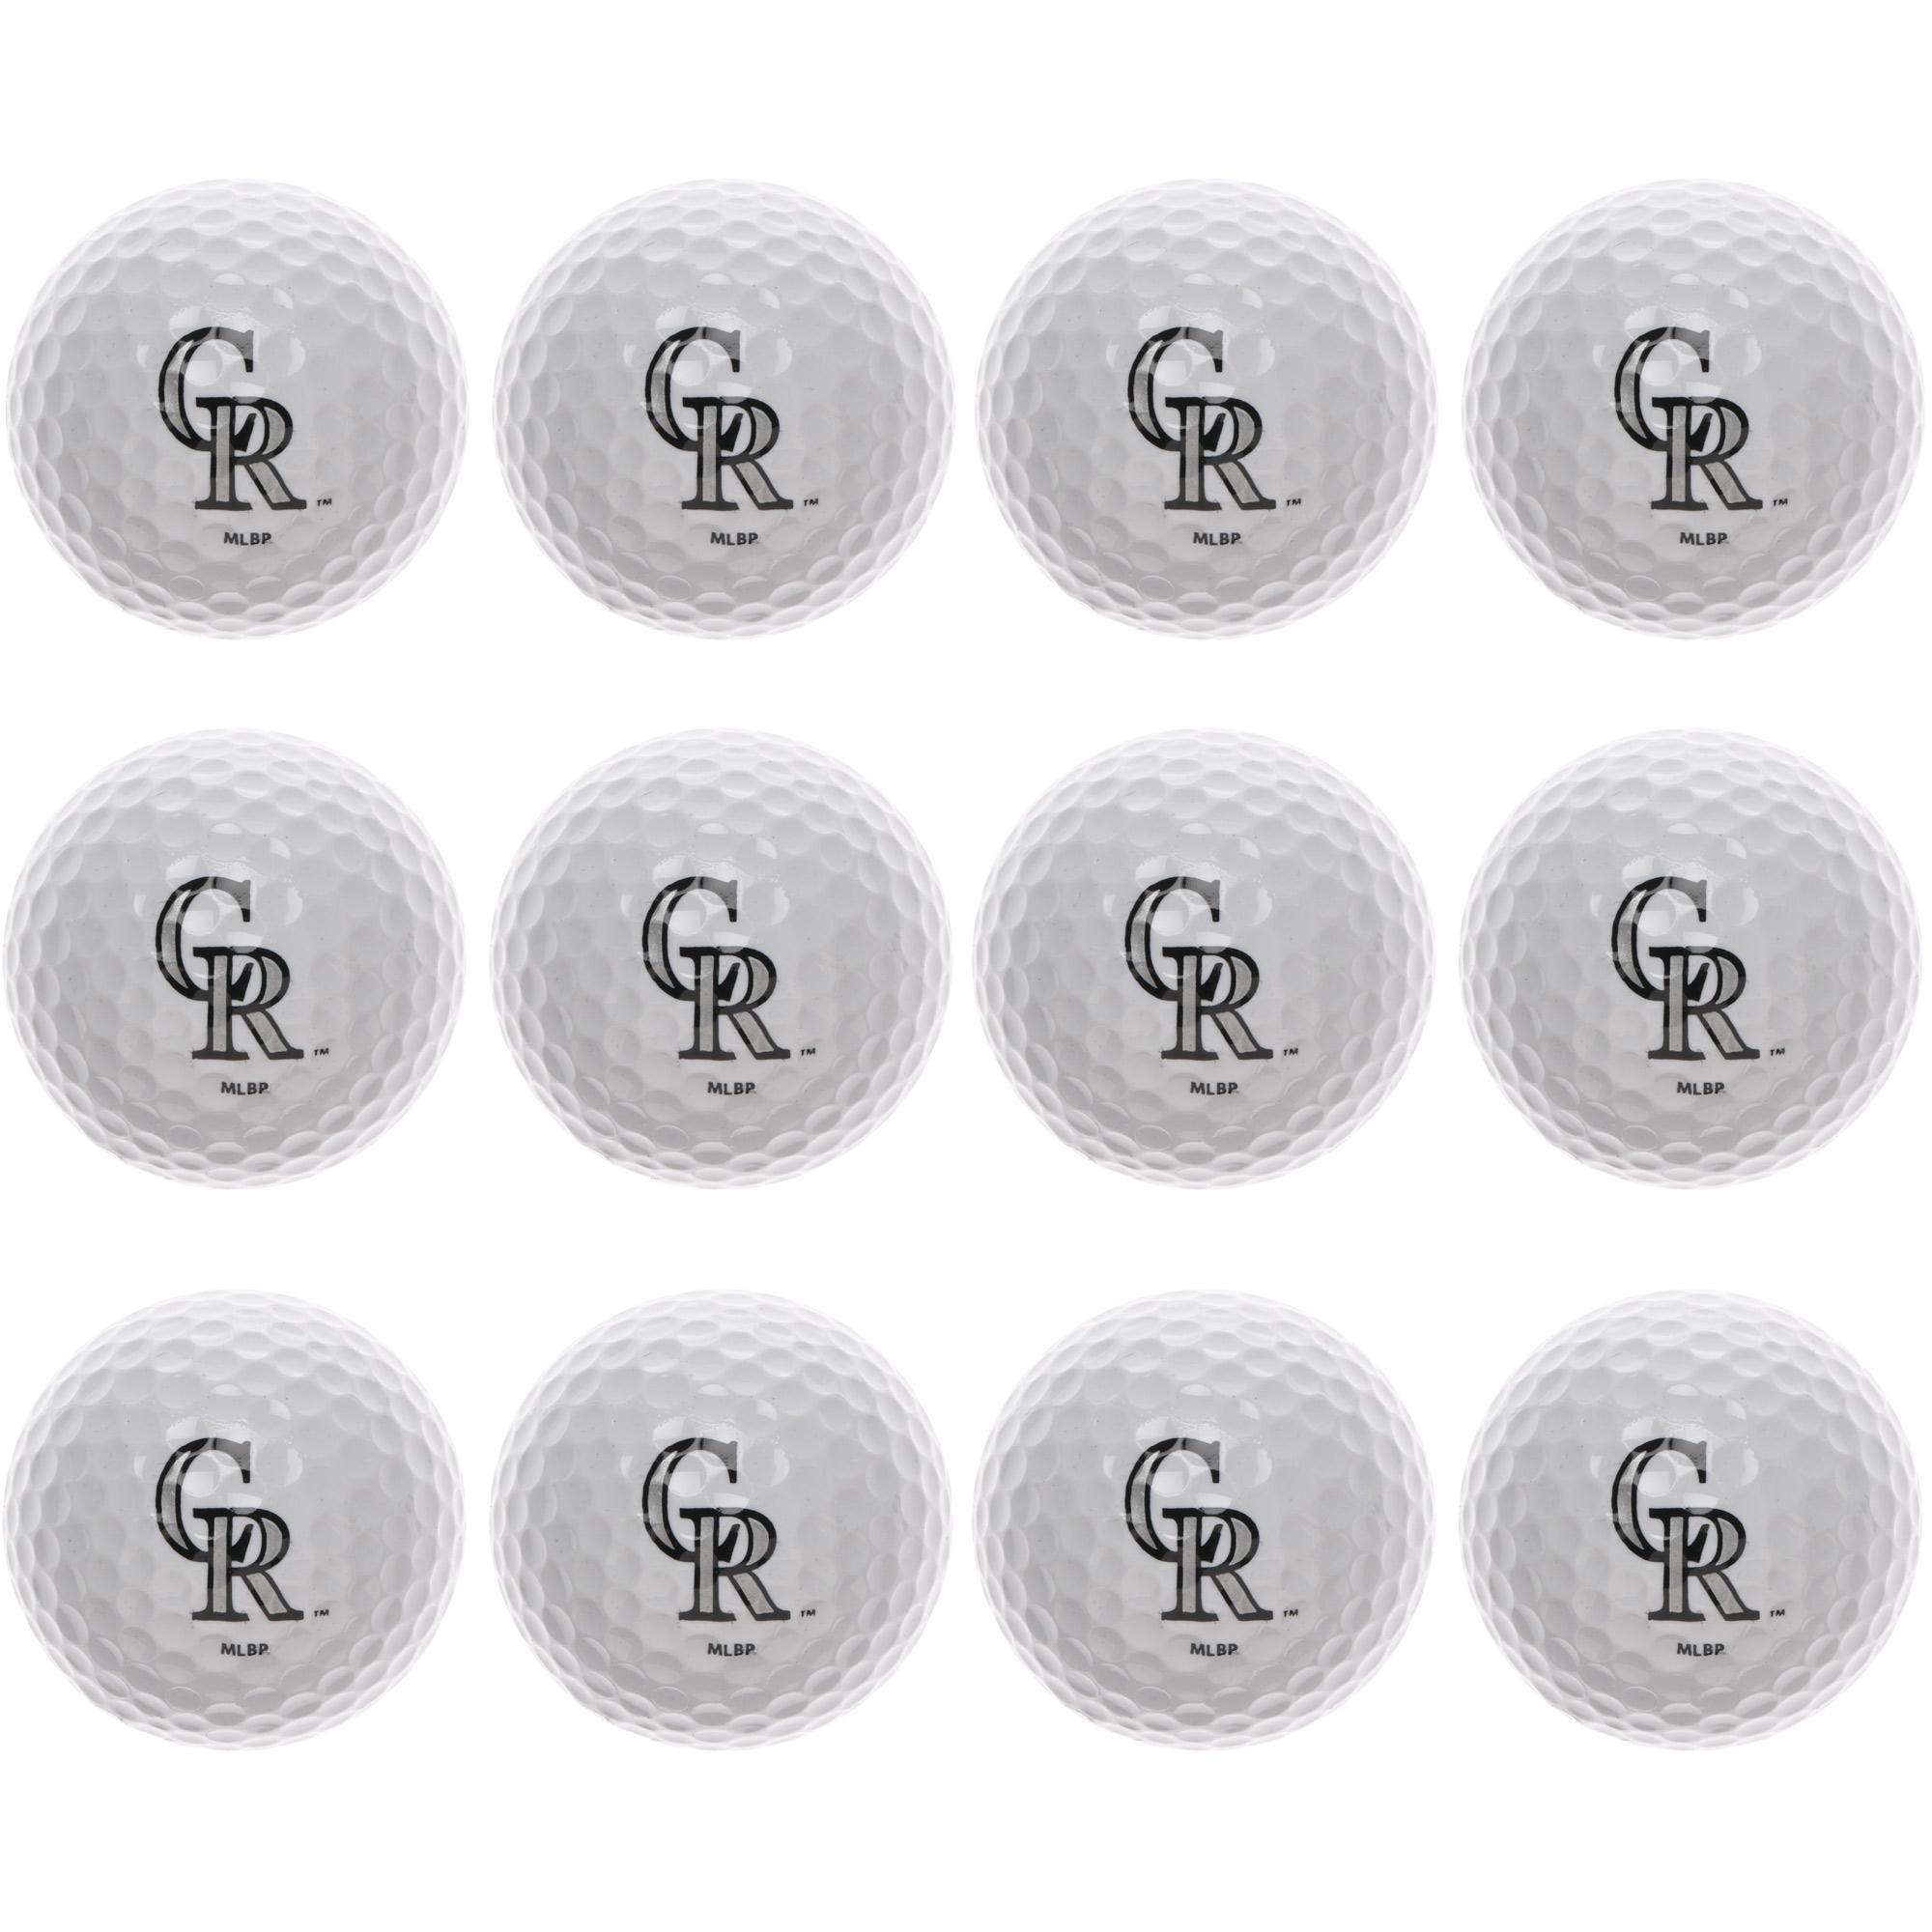 Colorado Rockies MLB Golf Balls 12 Pack by Team Golf - No Size